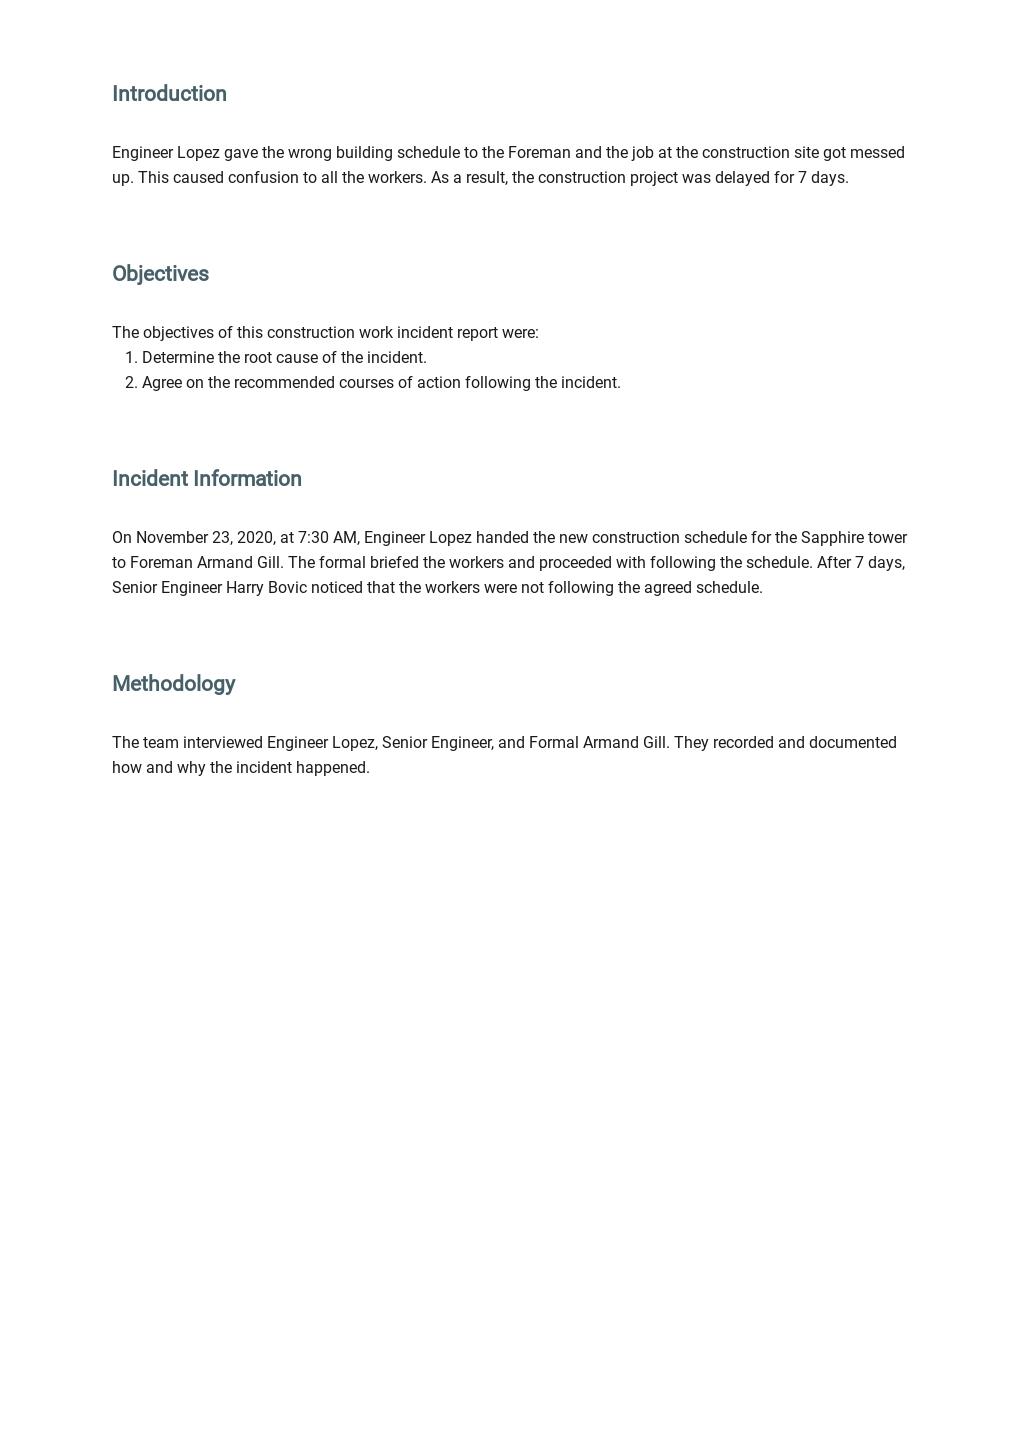 Construction Work Incident Report Template 1.jpe